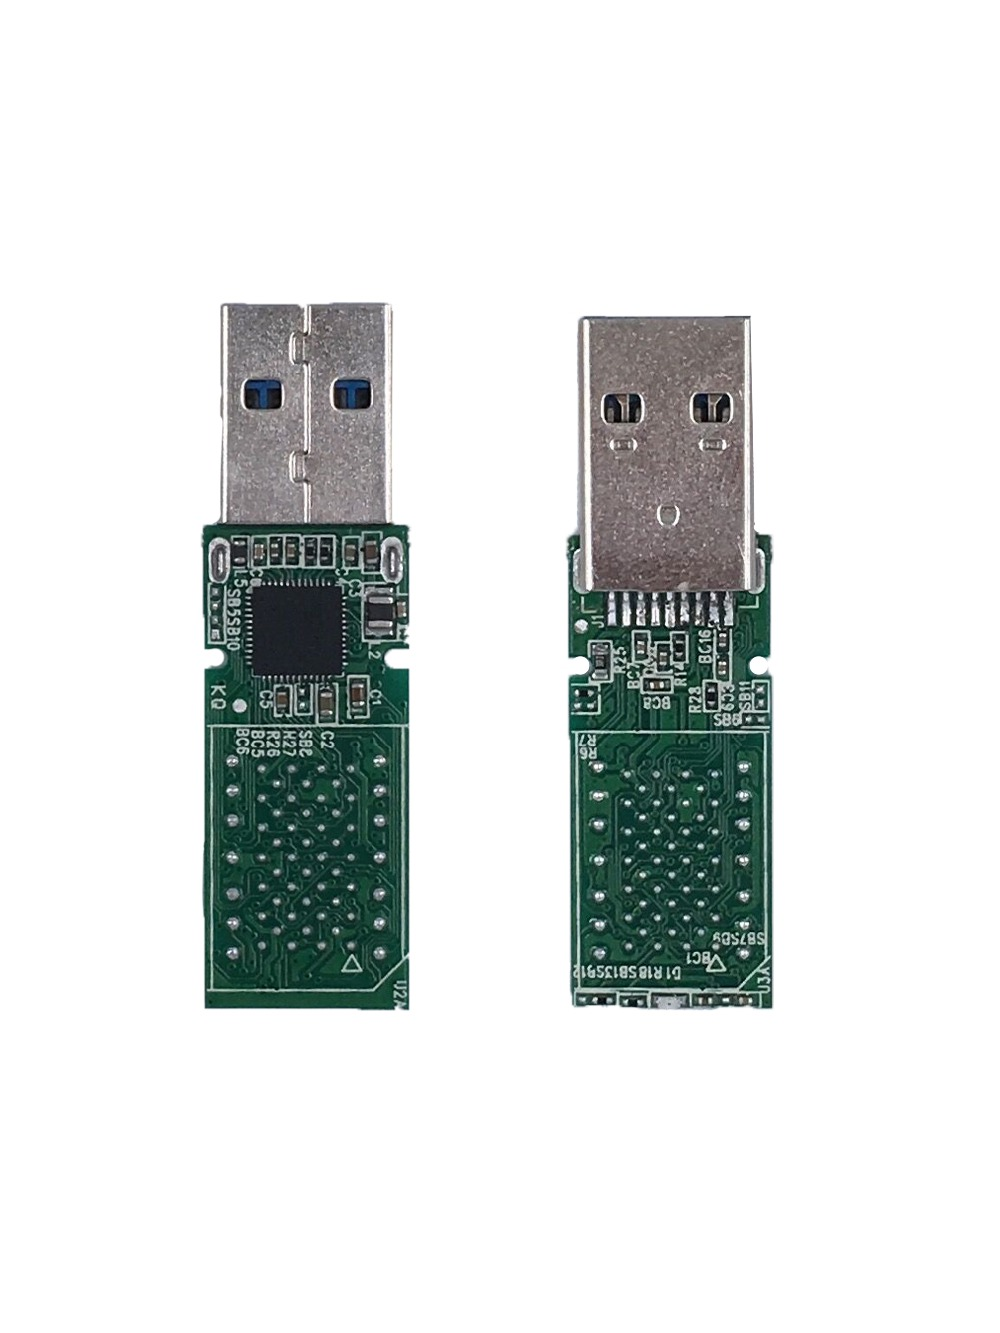 Newest Apple LGA60 SM3267L usb 3.0 U disk control board PCB board free crystal with LGA double-pad E2NAND Hynix E NAND FLASH DIY цены онлайн